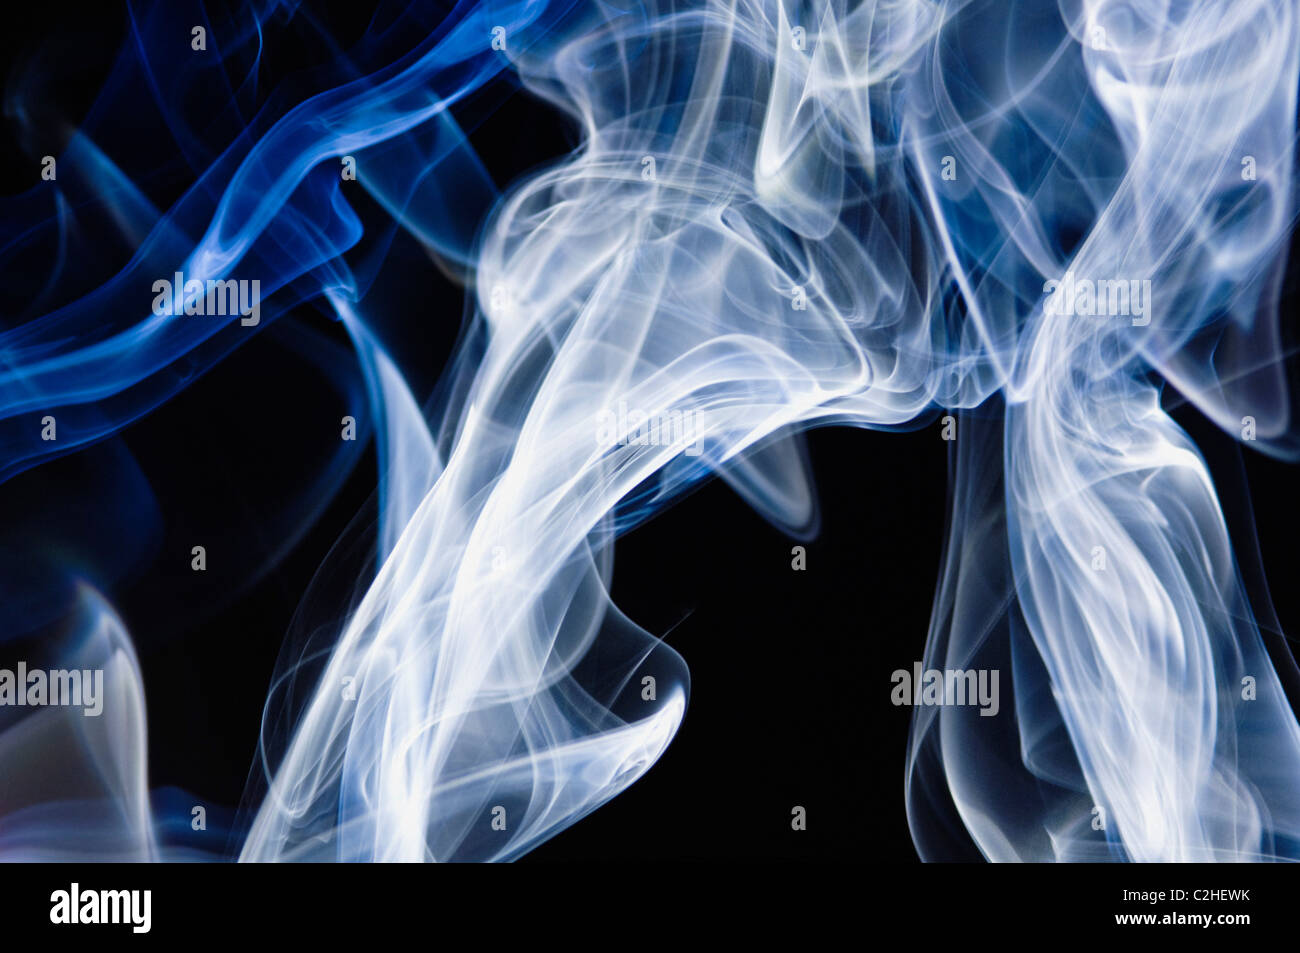 Smoke Patterns - Stock Image